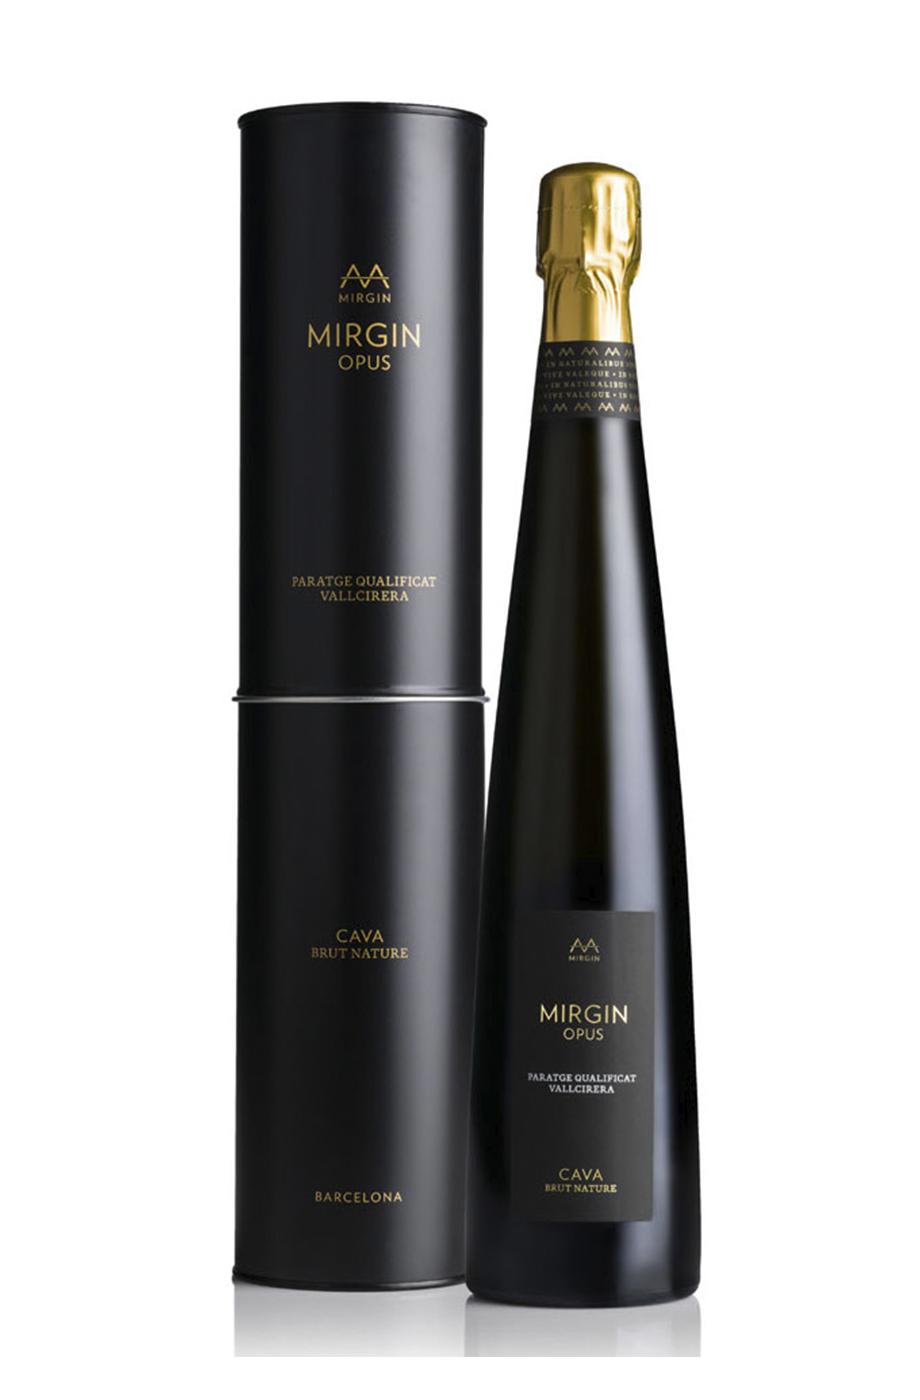 AA Mirgin Opus| Alta Alella - Winexfood